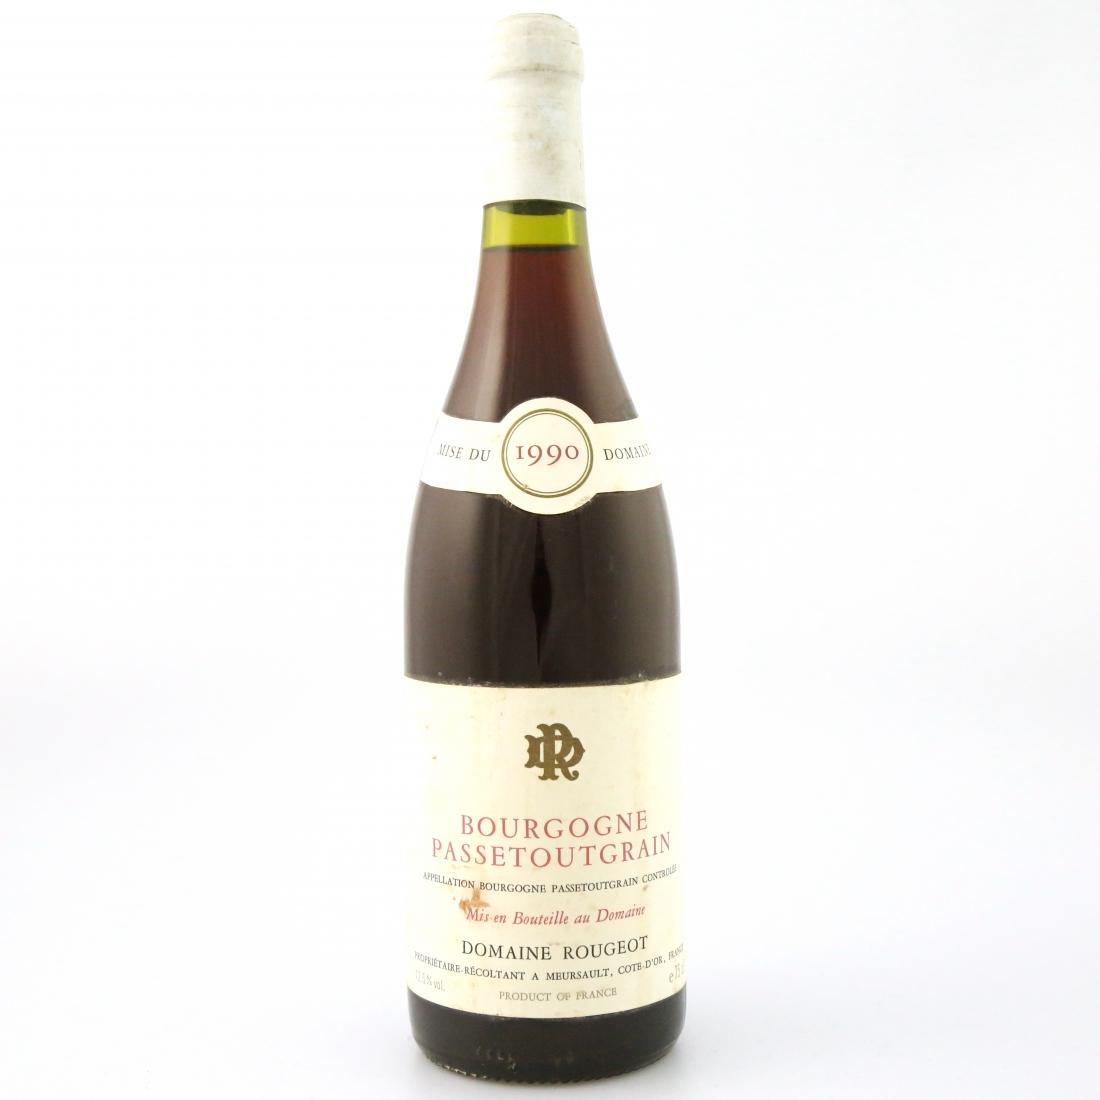 Dom. Rougeot 1990 Bourgogne Passetoutgrain